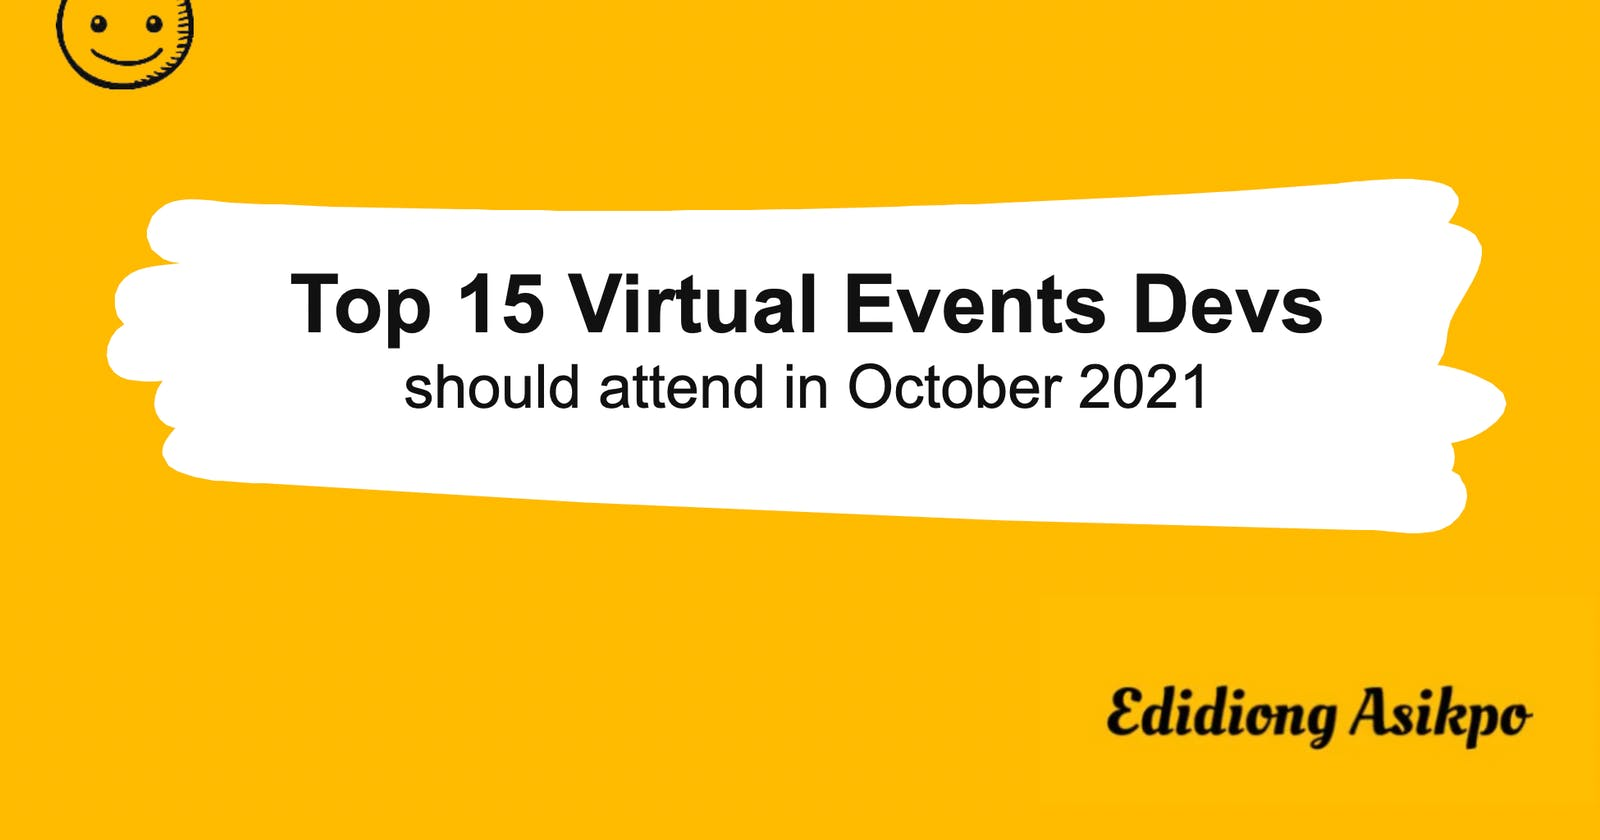 Top 15 Virtual Events Devs Should Attend in October 2021